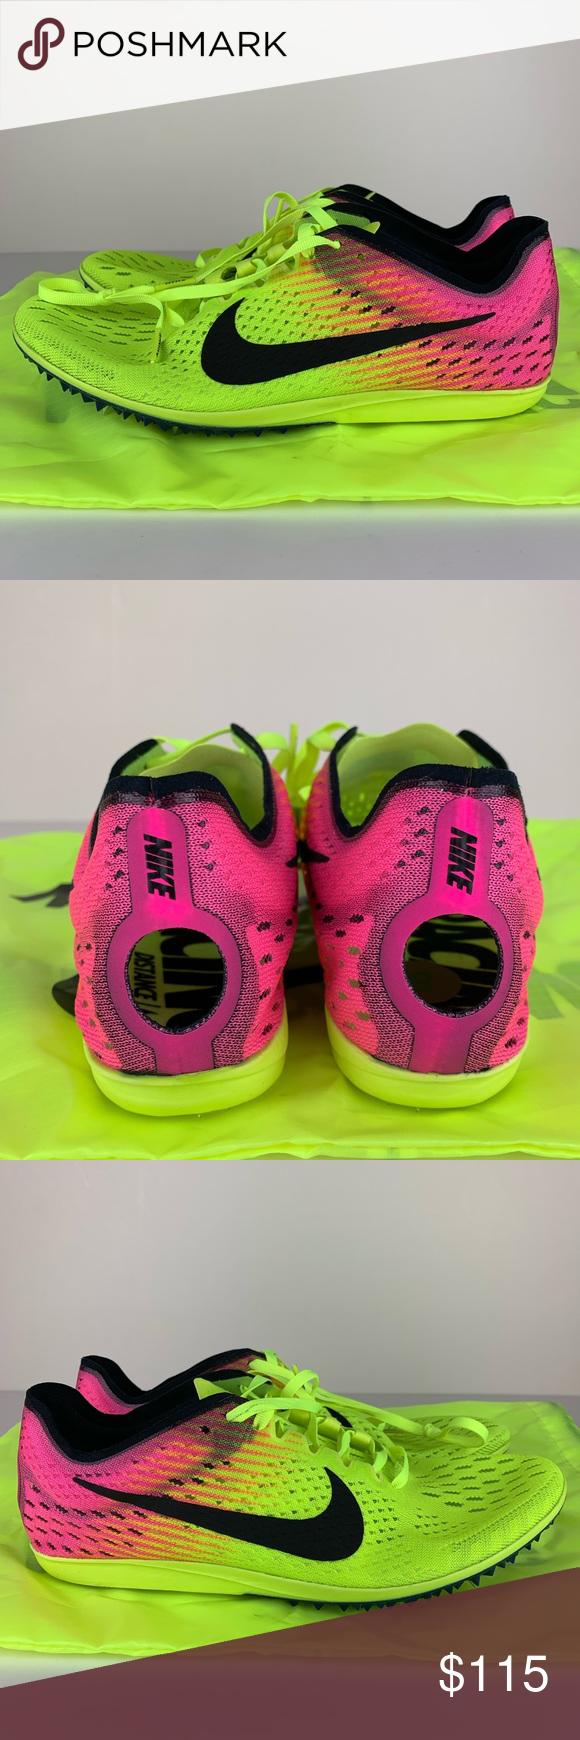 on sale b845d a8129 Nike Zoom Matumbo 3 OC Spike Track Field Shoes Río Nike Zoom Matumbo 3 OC  Spikes